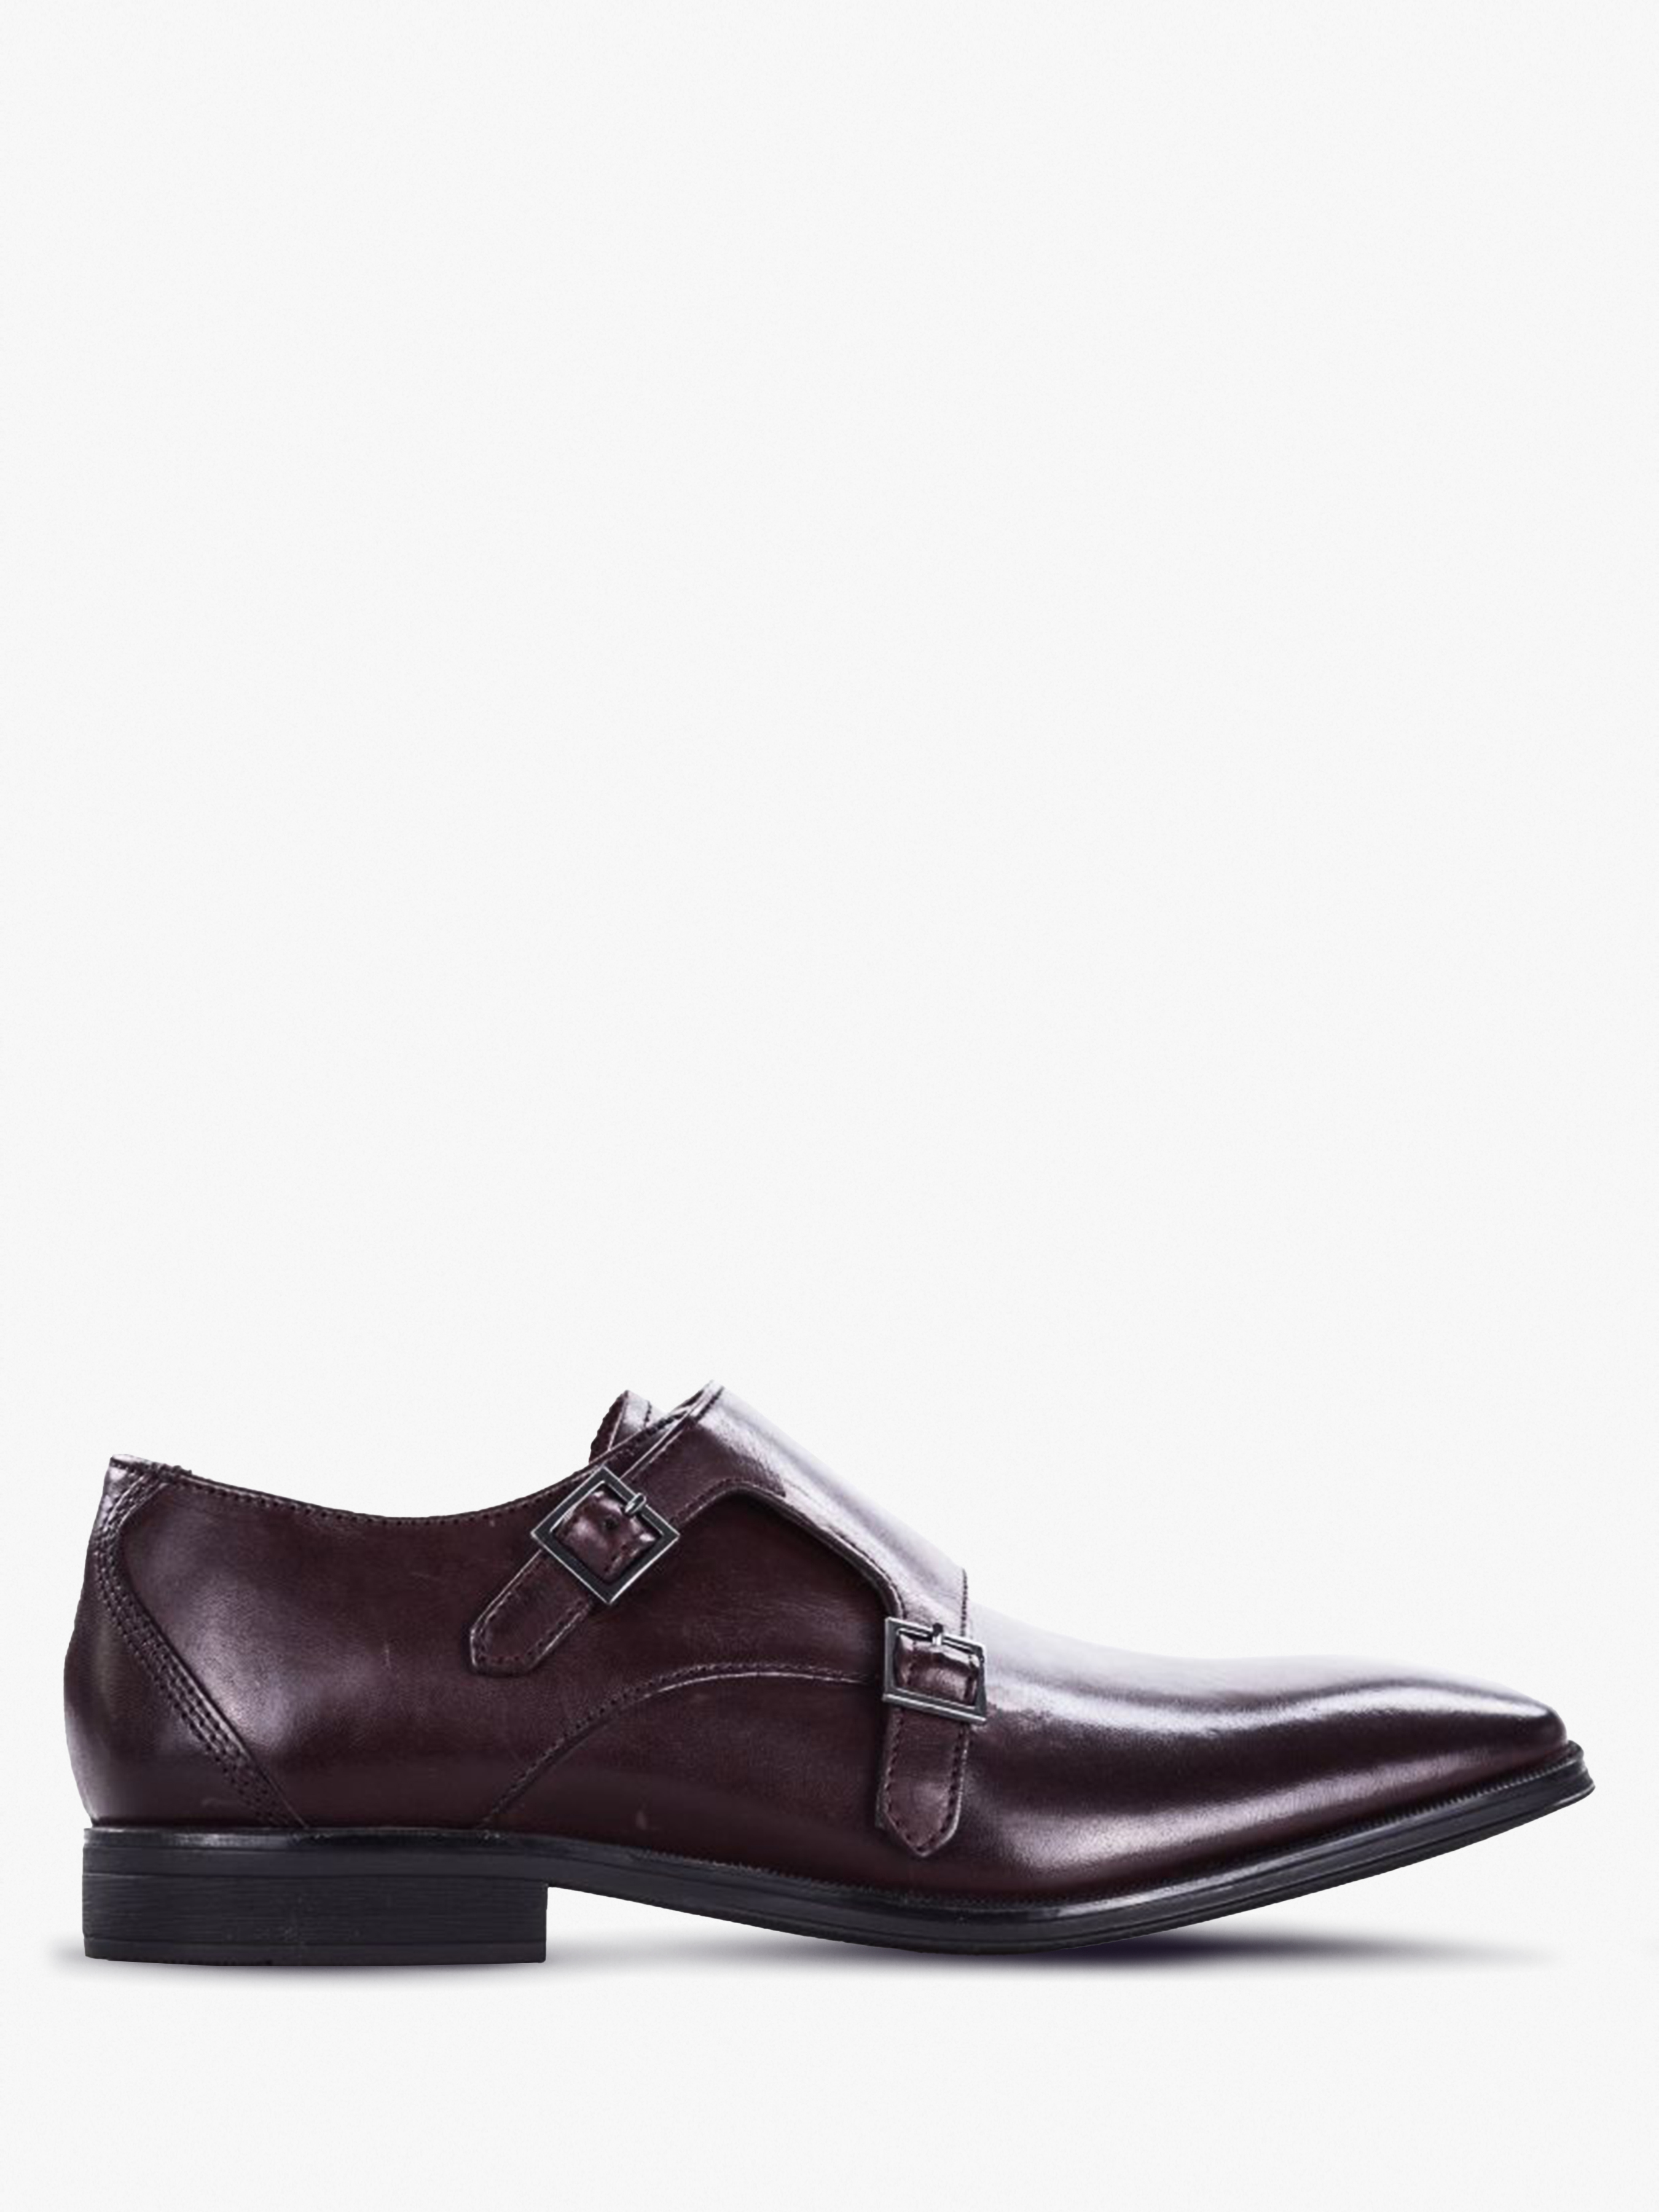 Туфли для мужчин Clarks Gilman Step OM2896 размеры обуви, 2017